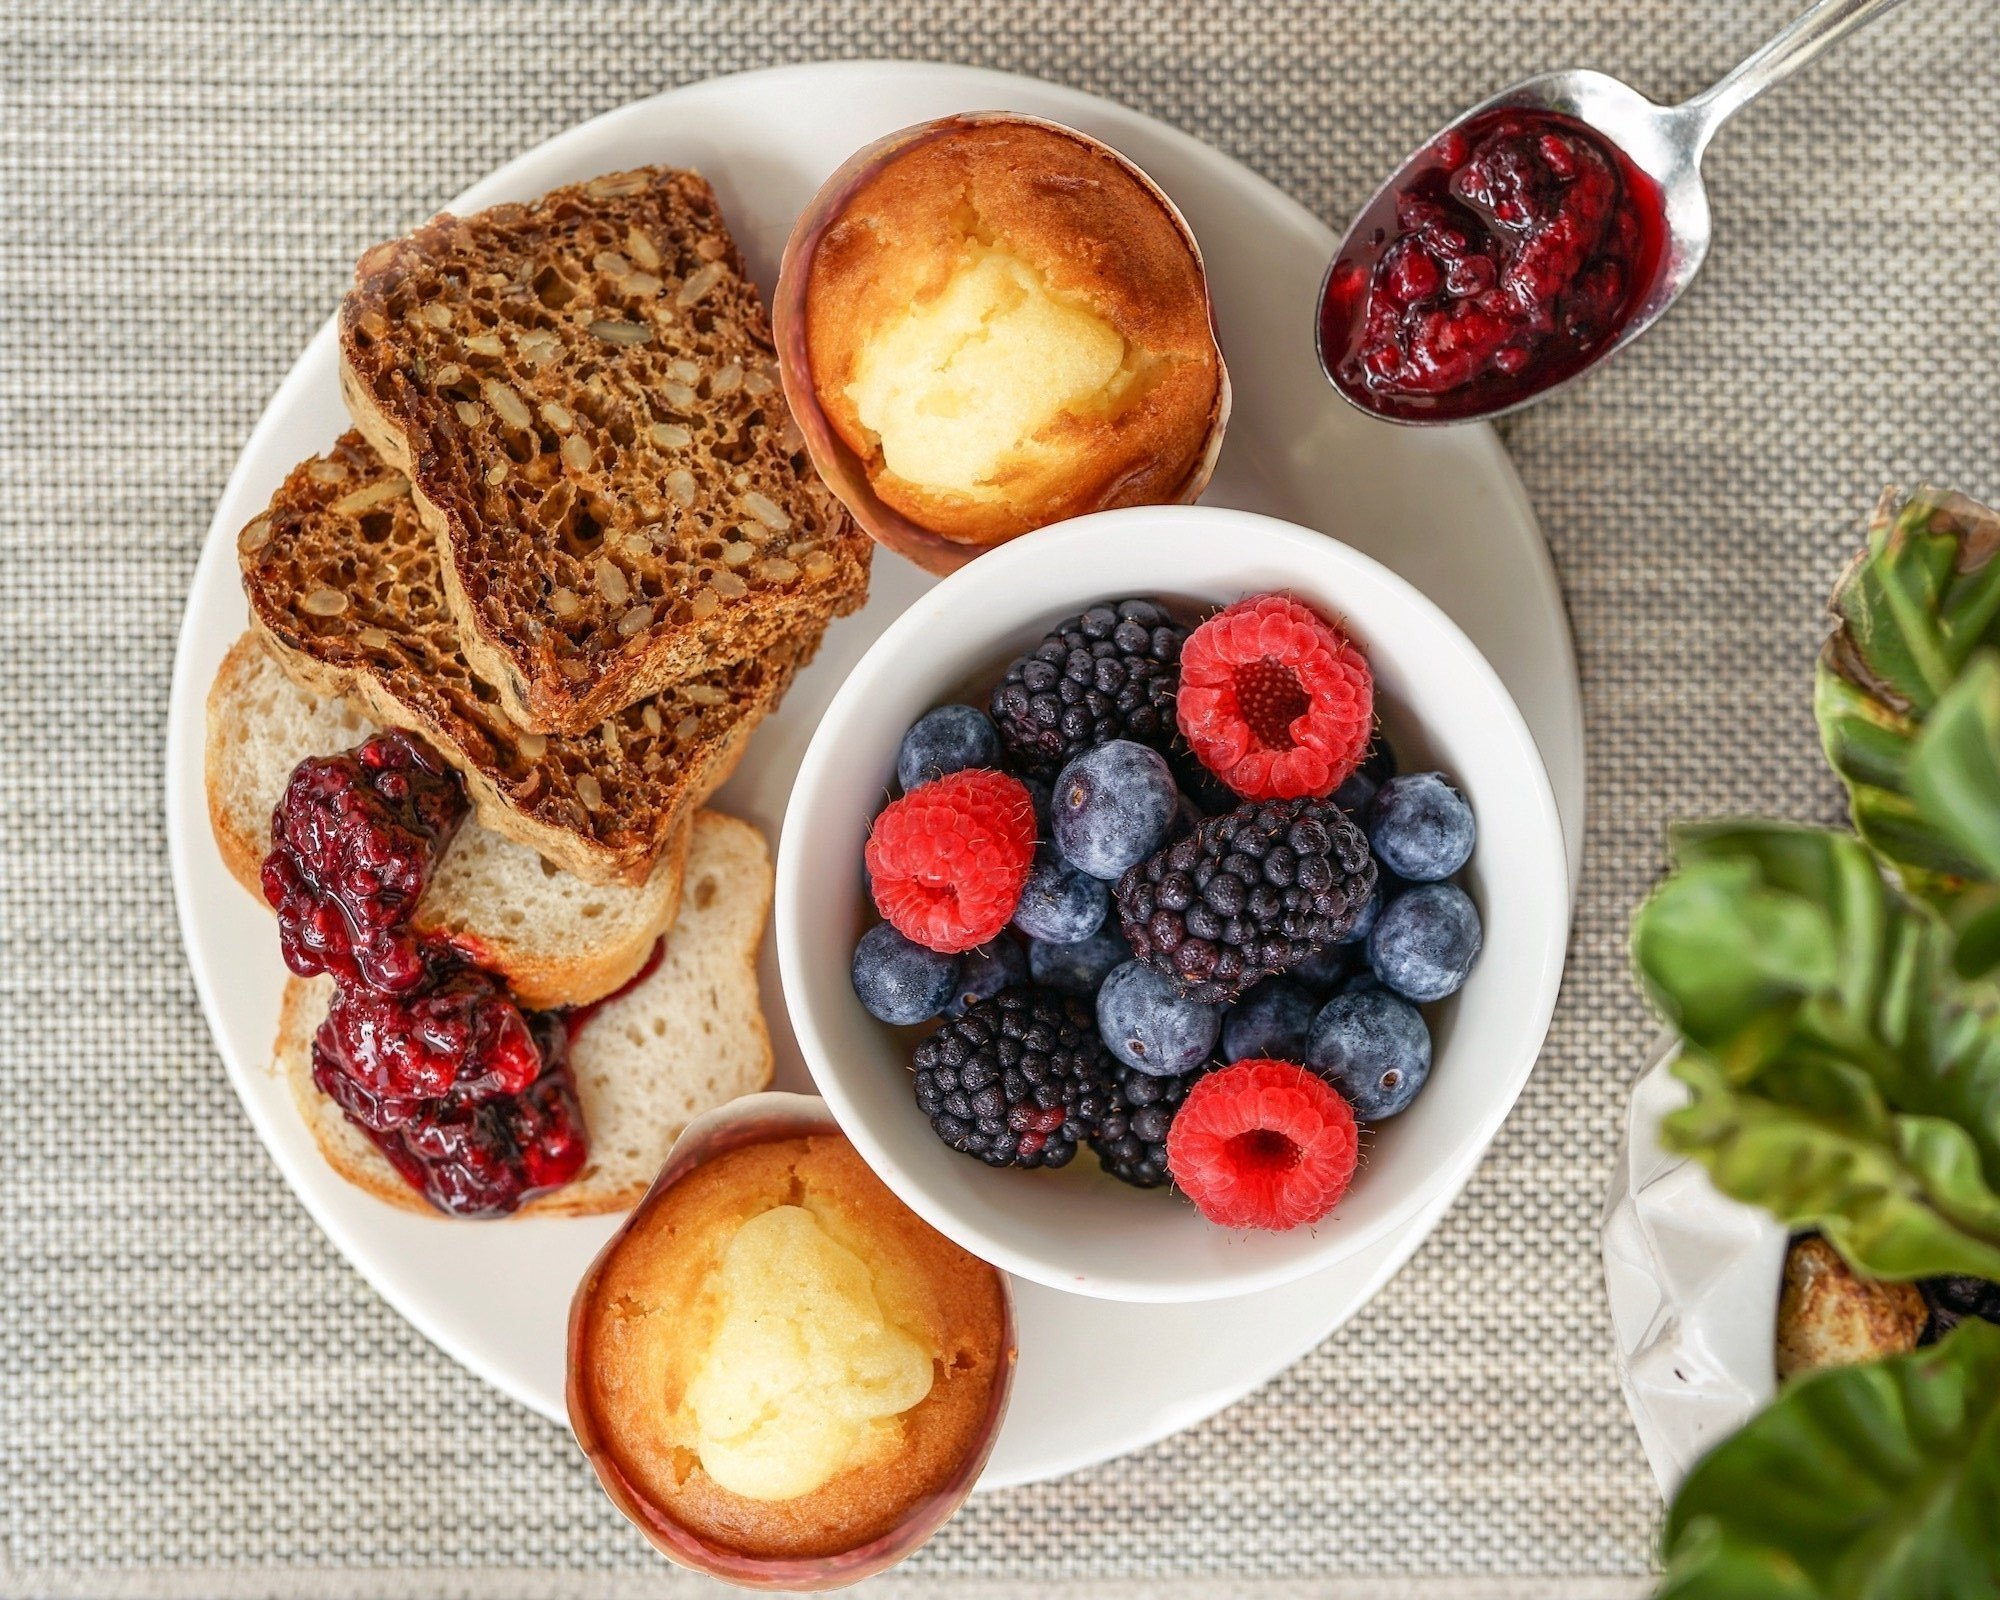 10 Strategies to Avoid Gluten in Restaurants 1